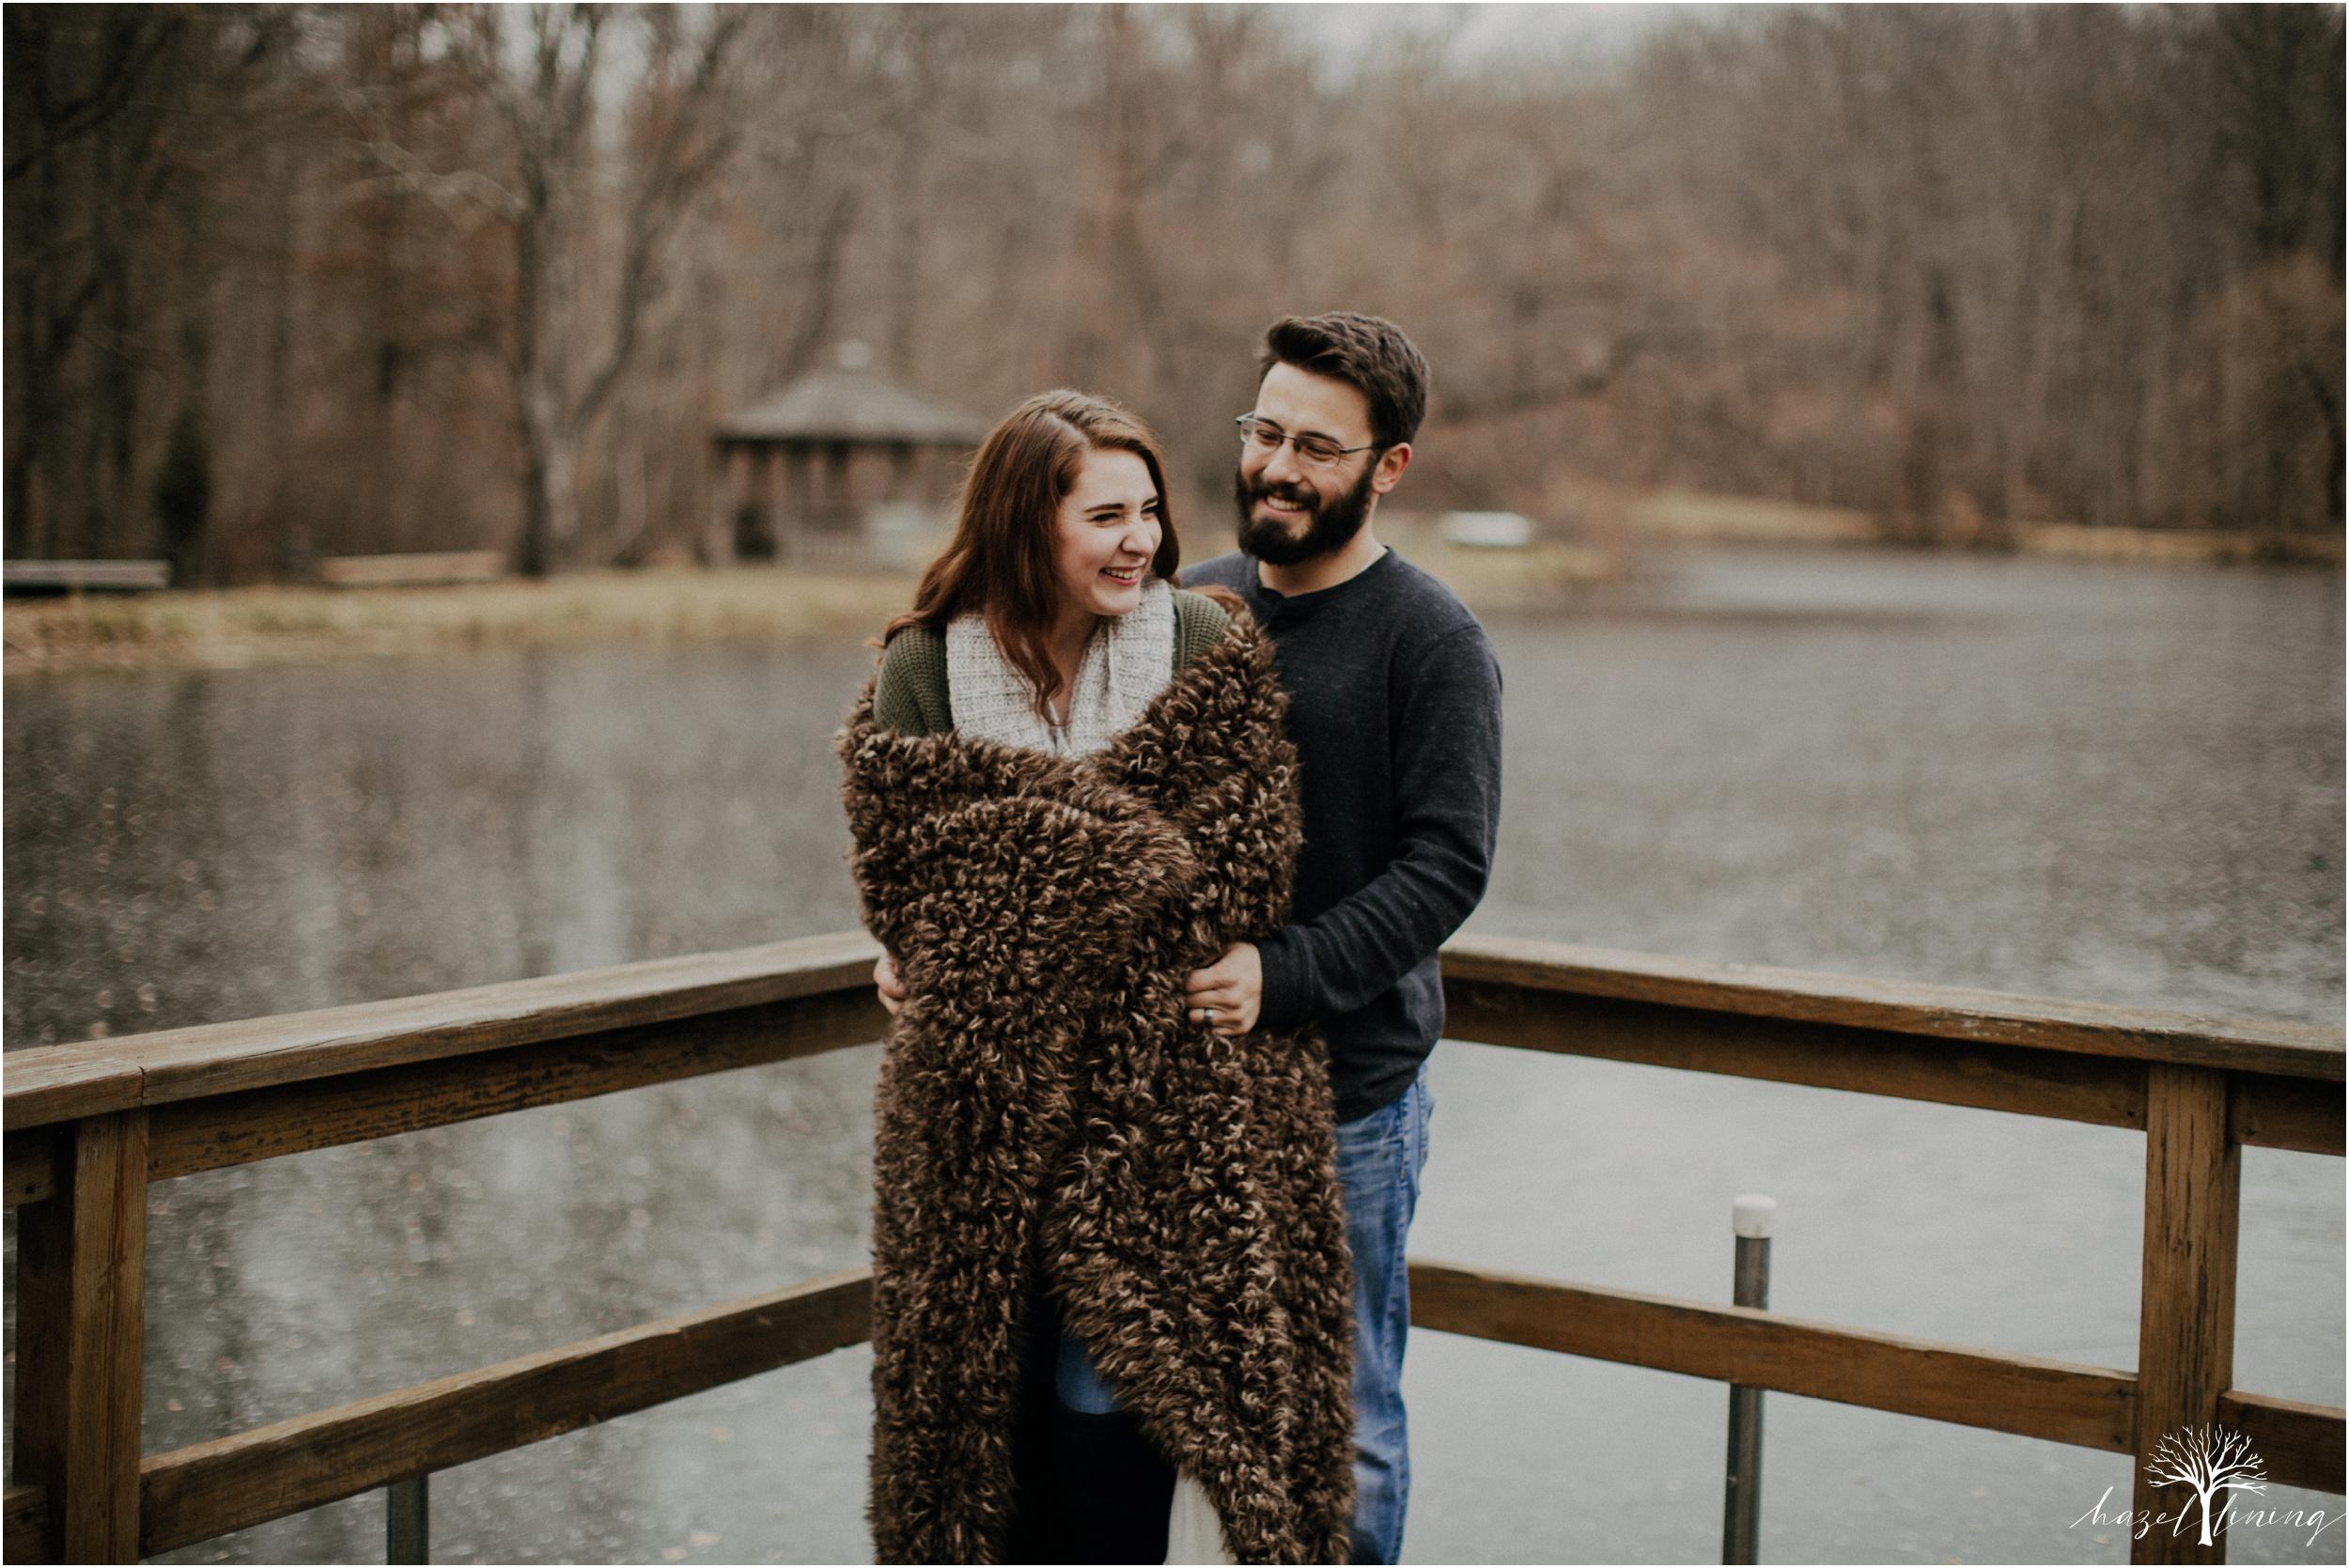 evan-maggie-lesh-one-year-anniversary-winter-shoot-camp-menolan-pennsylvania_0051.jpg